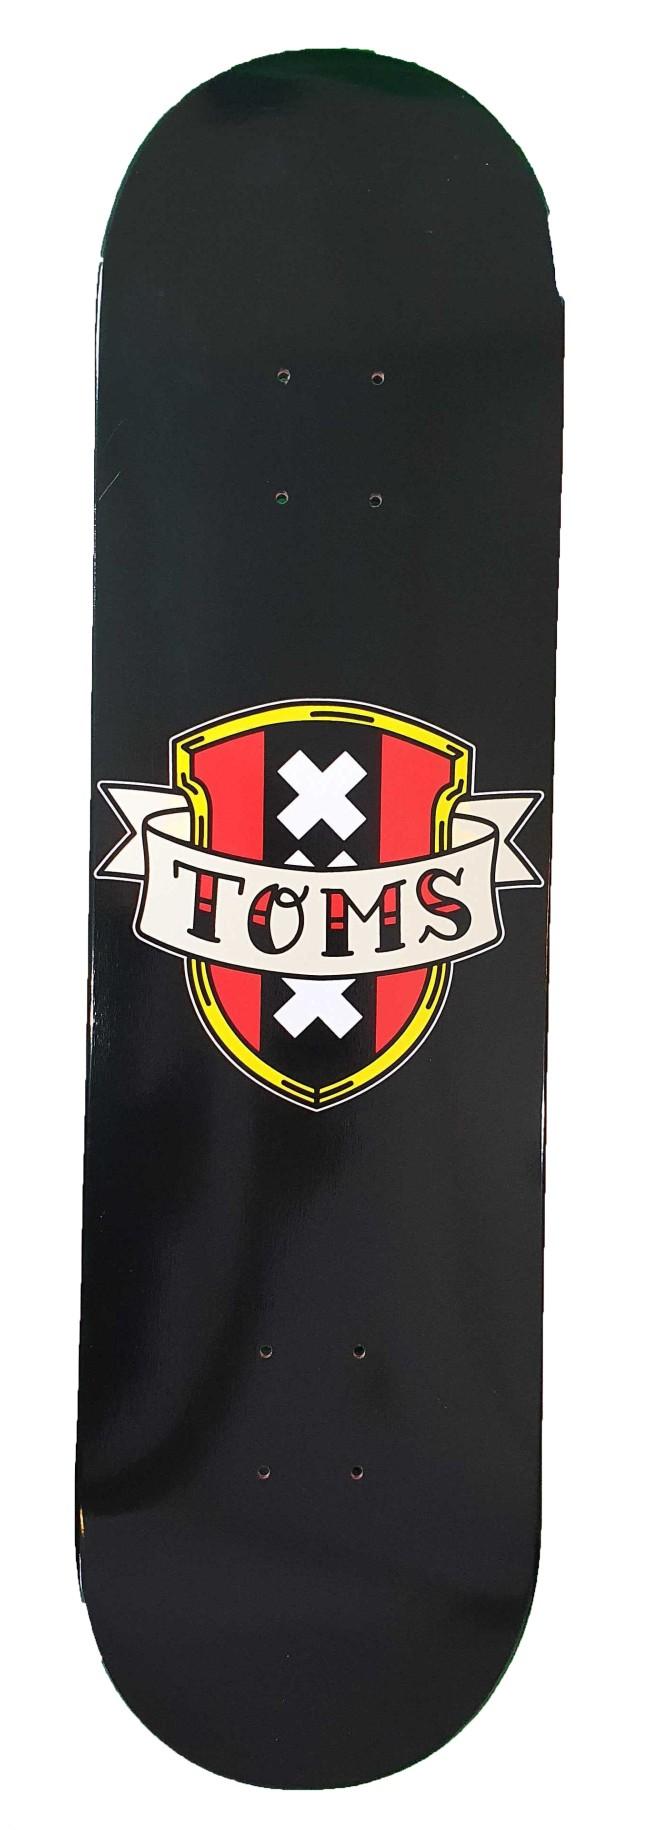 TOMS SHIELD DECK - BLACK